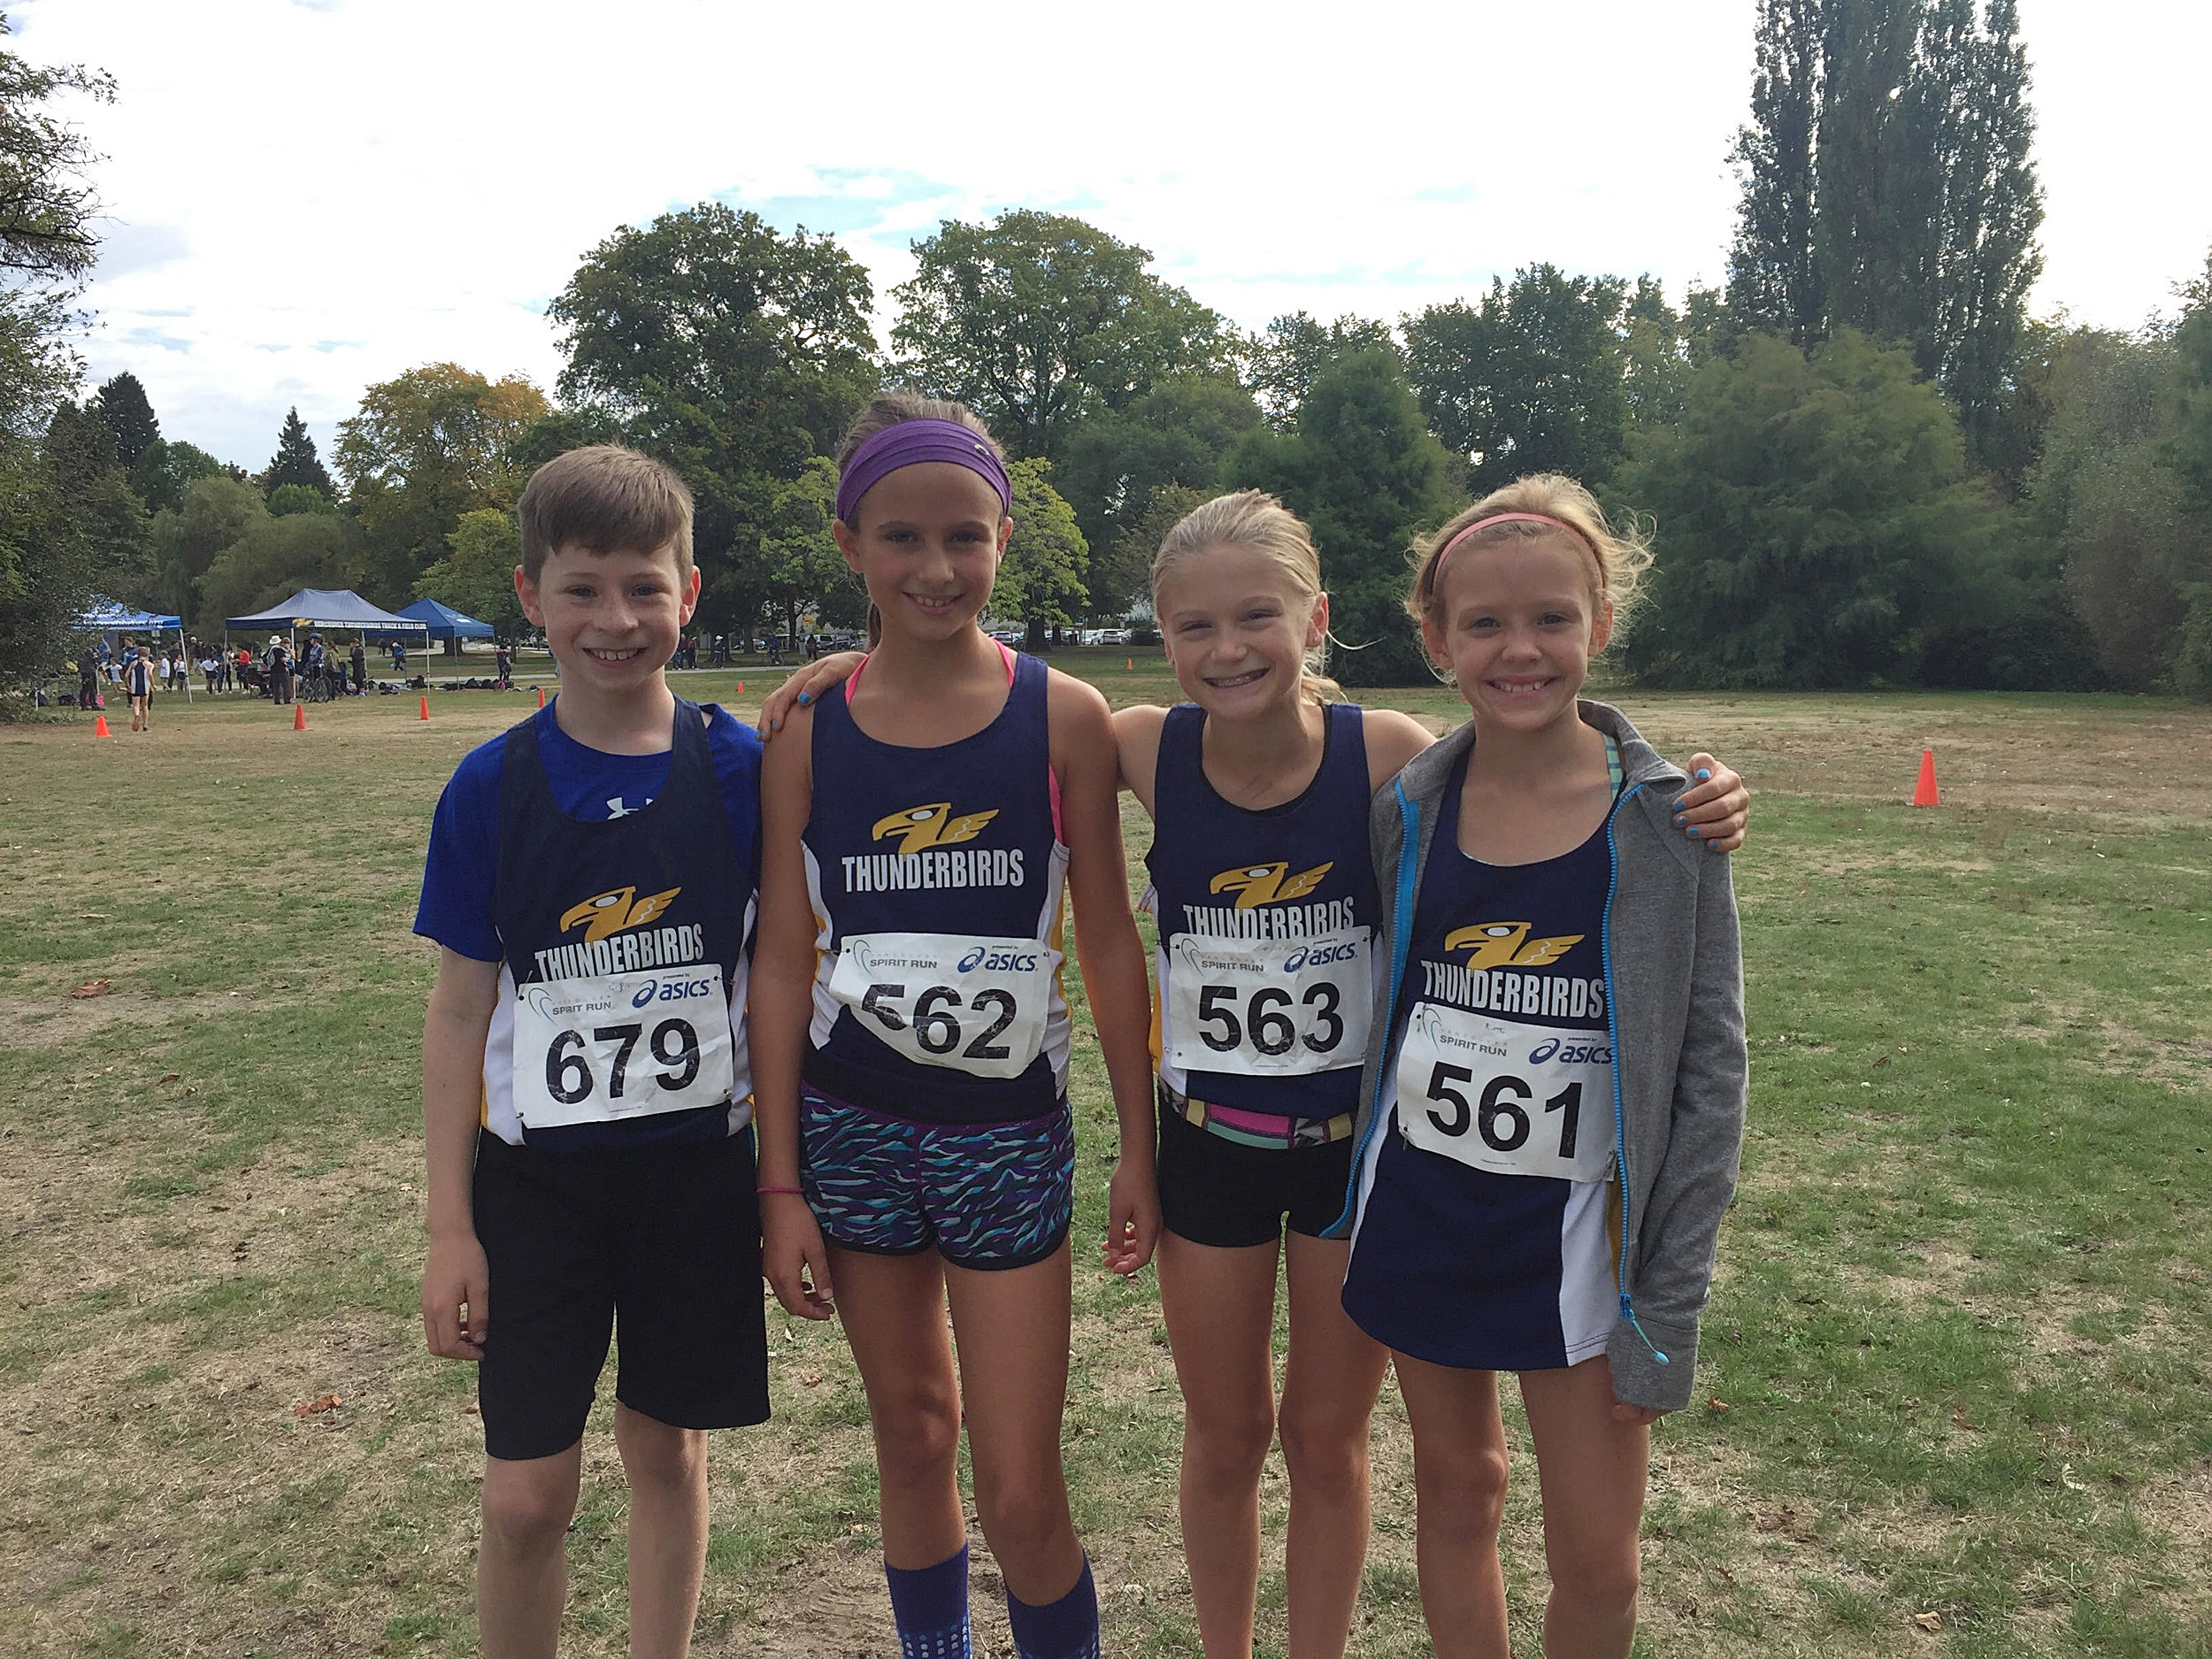 Thunderbird Athletes Griffin Cole, Gabriella Barton, Ruby Forsyth, and Kate Logan.